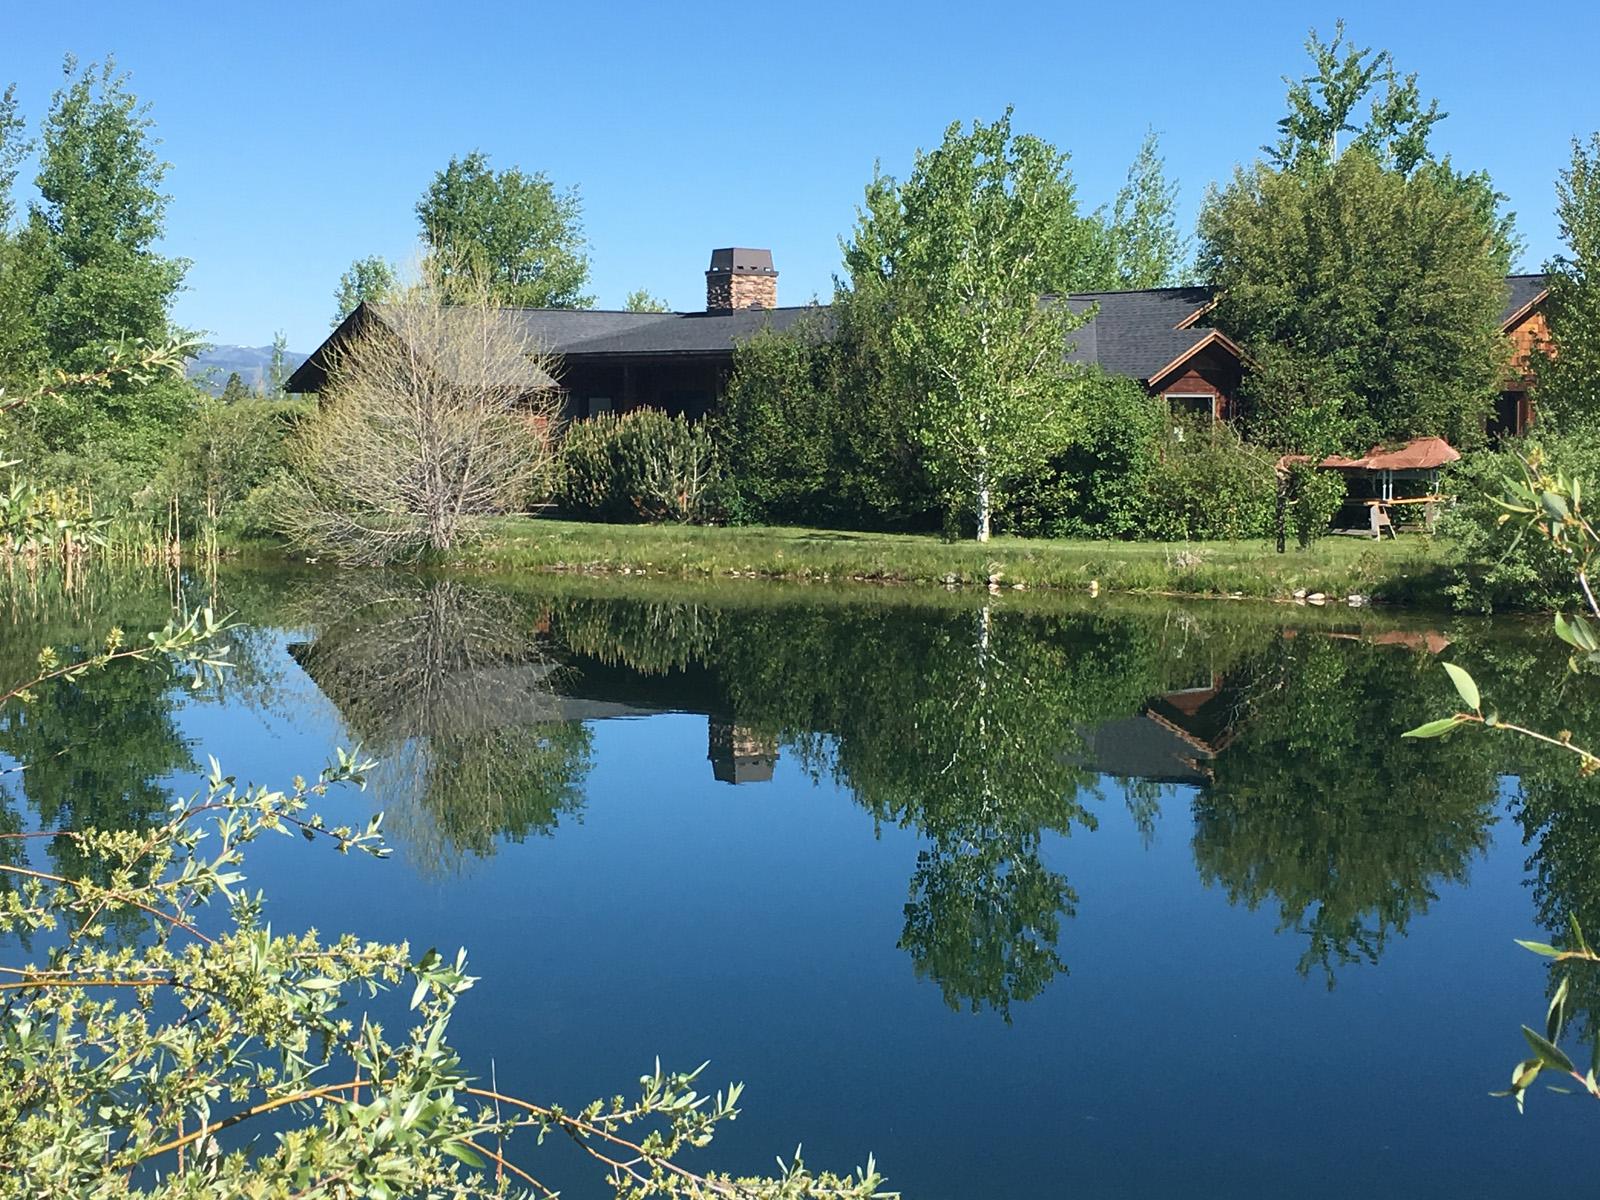 独户住宅 为 销售 在 Water View in Victor 585 Cattail Drive 维克多, 爱达荷州, 83455 Jackson Hole, 美国